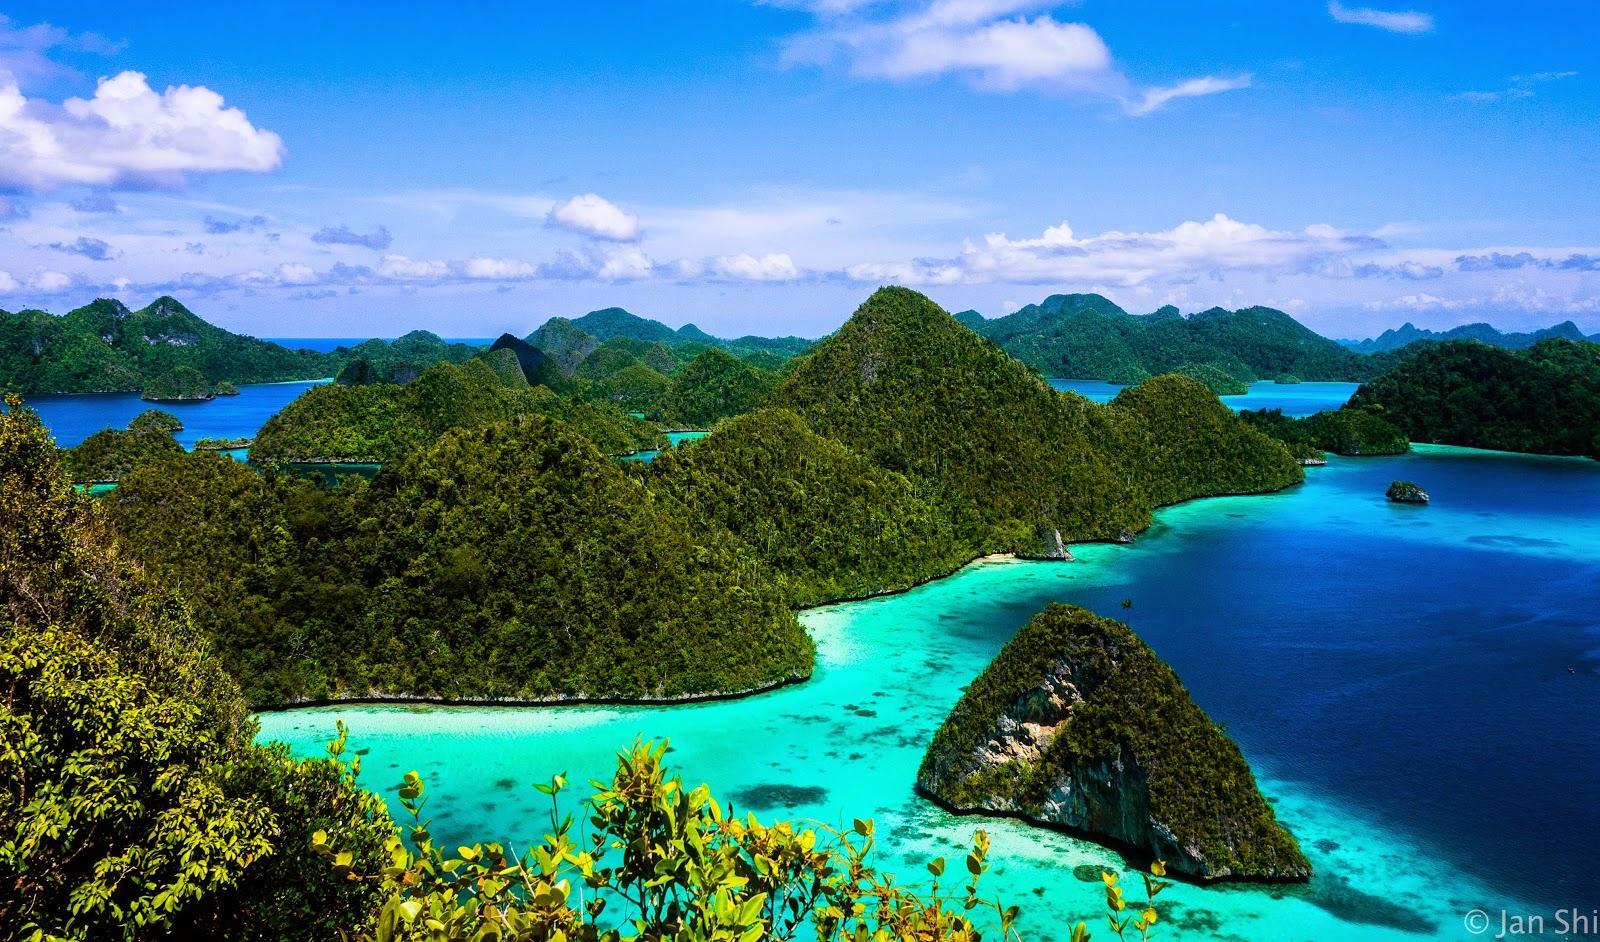 Martin Kosasi S Blog Optimalisasi Kekayaan Alam Indonesia